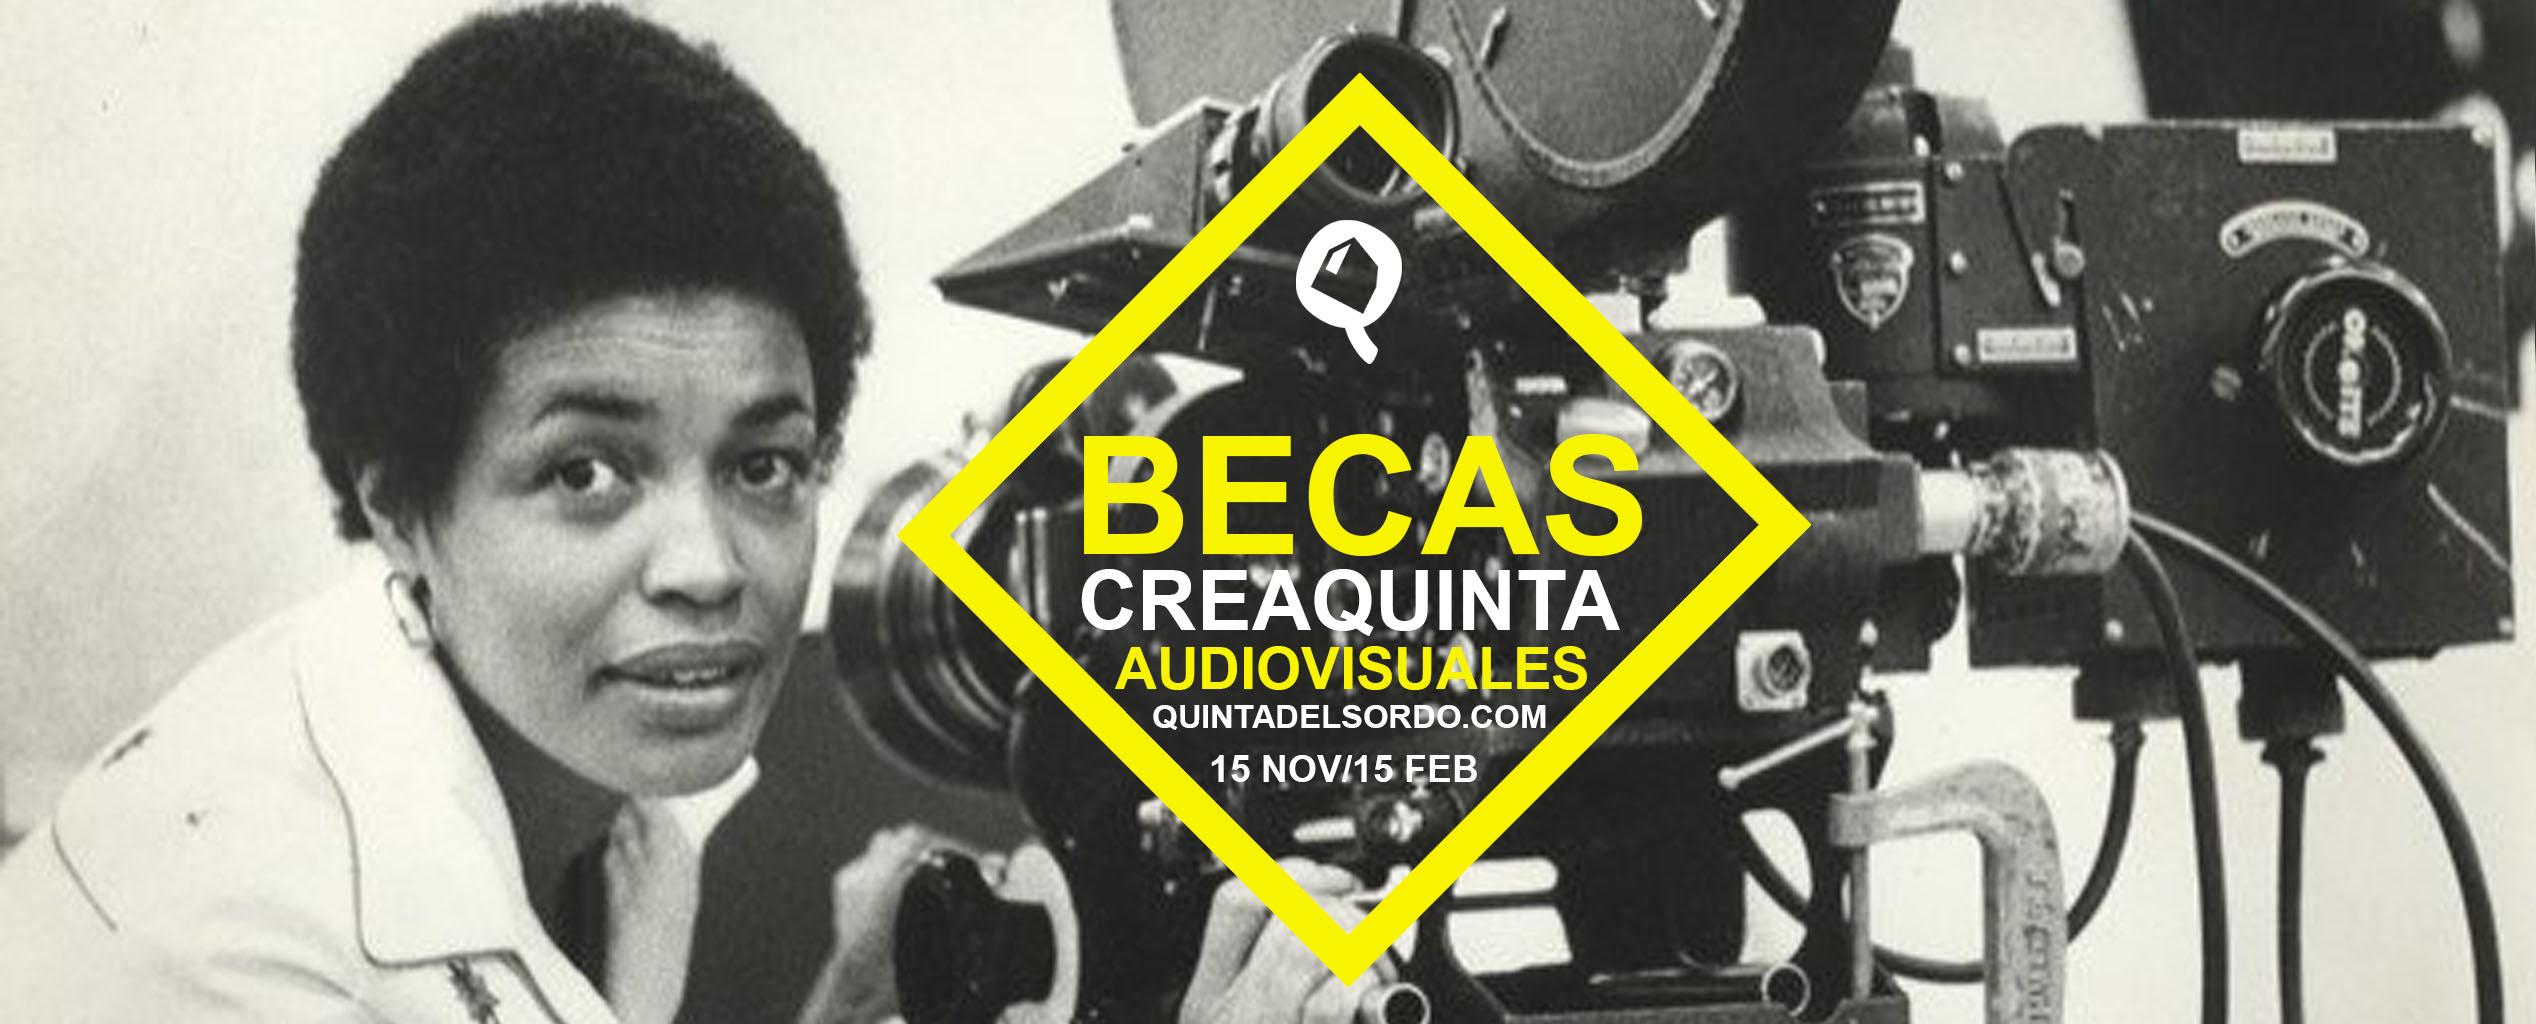 BECAS-COWORKING-CREA-QUINTA-3